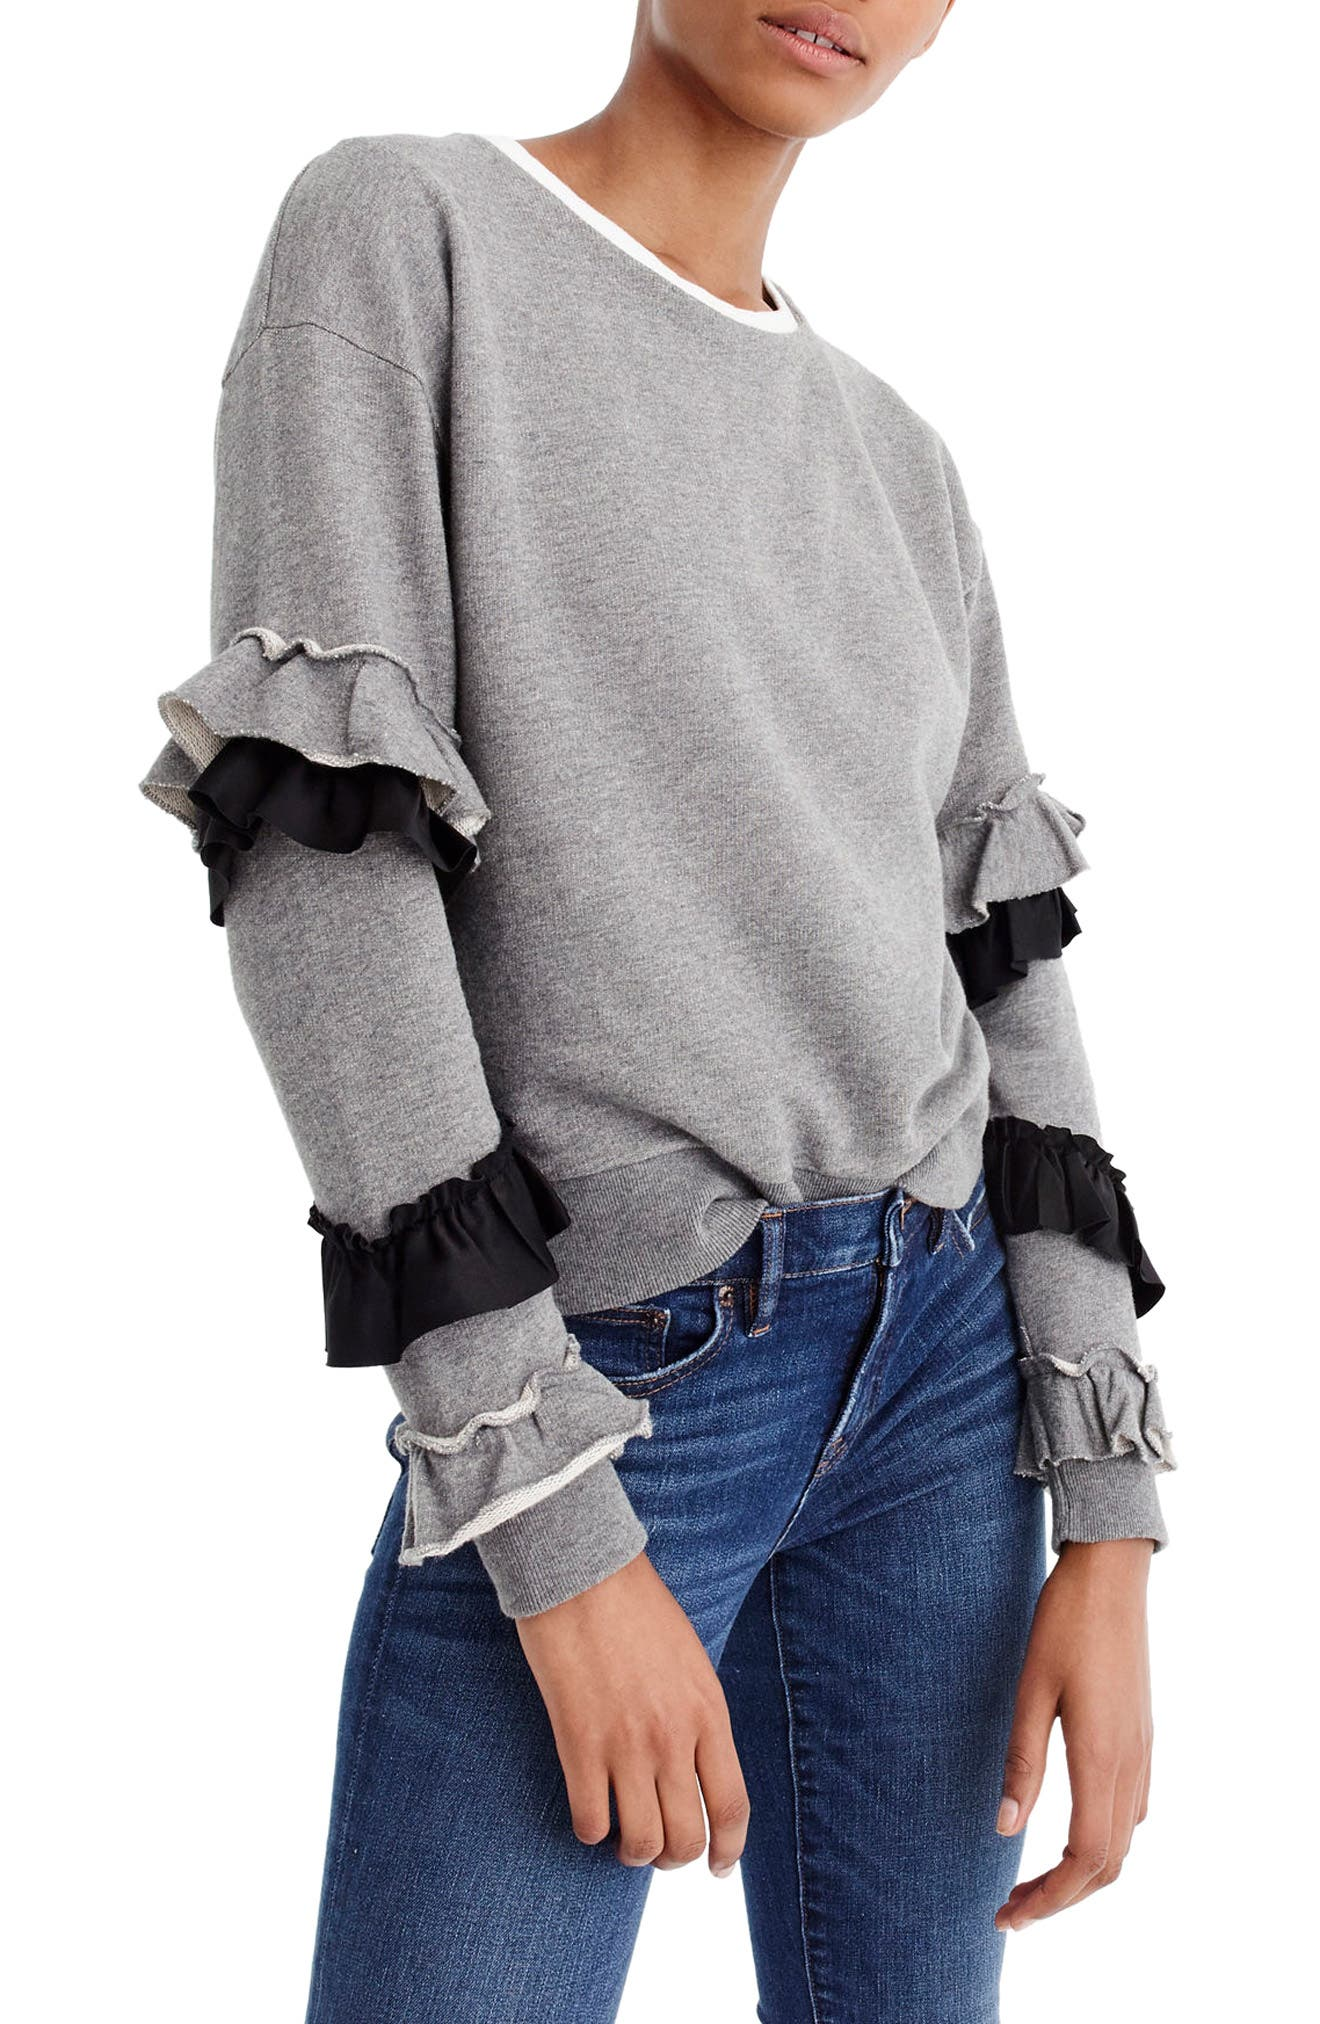 Alternate Image 1 Selected - J.Crew Ruffle Sleeve Sweatshirt